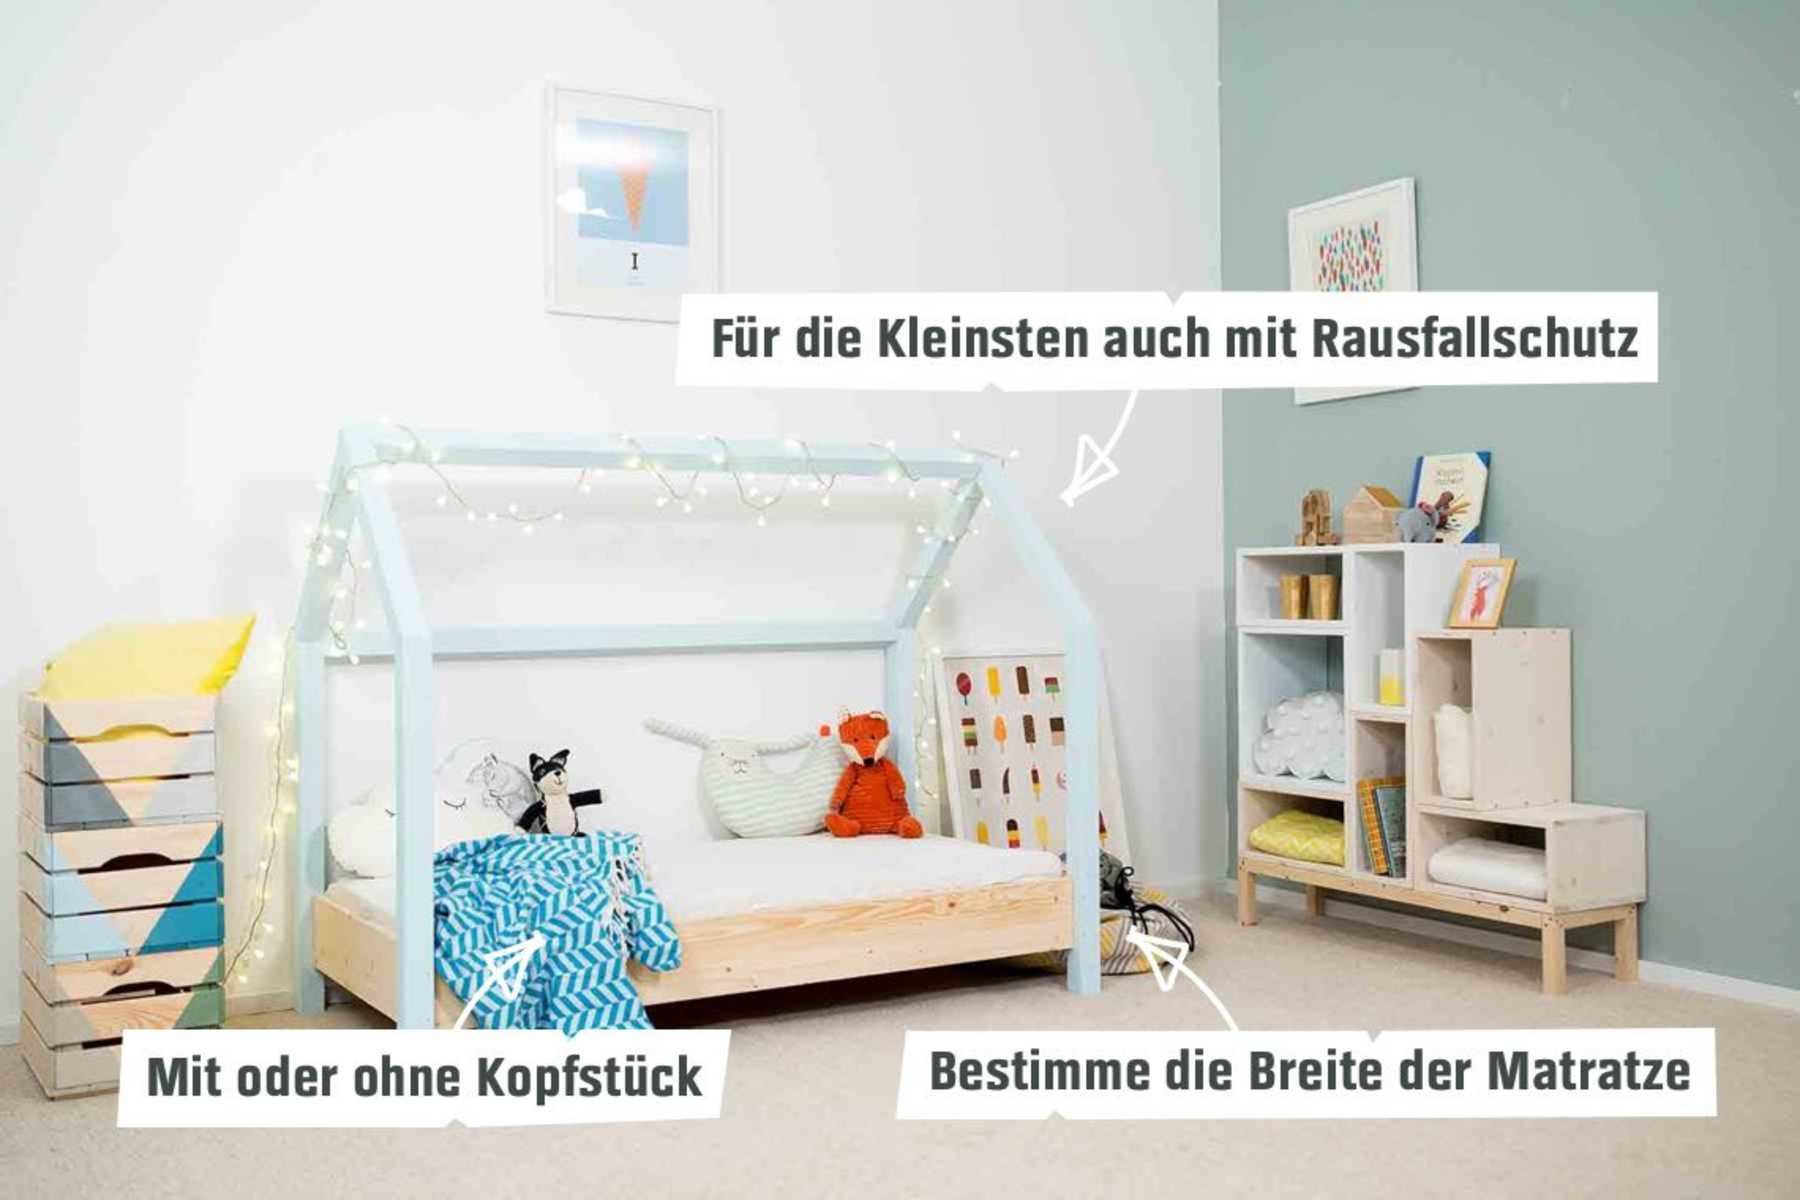 Full Size of Betten 100x200 Bett Weiß Wohnzimmer Hausbett 100x200